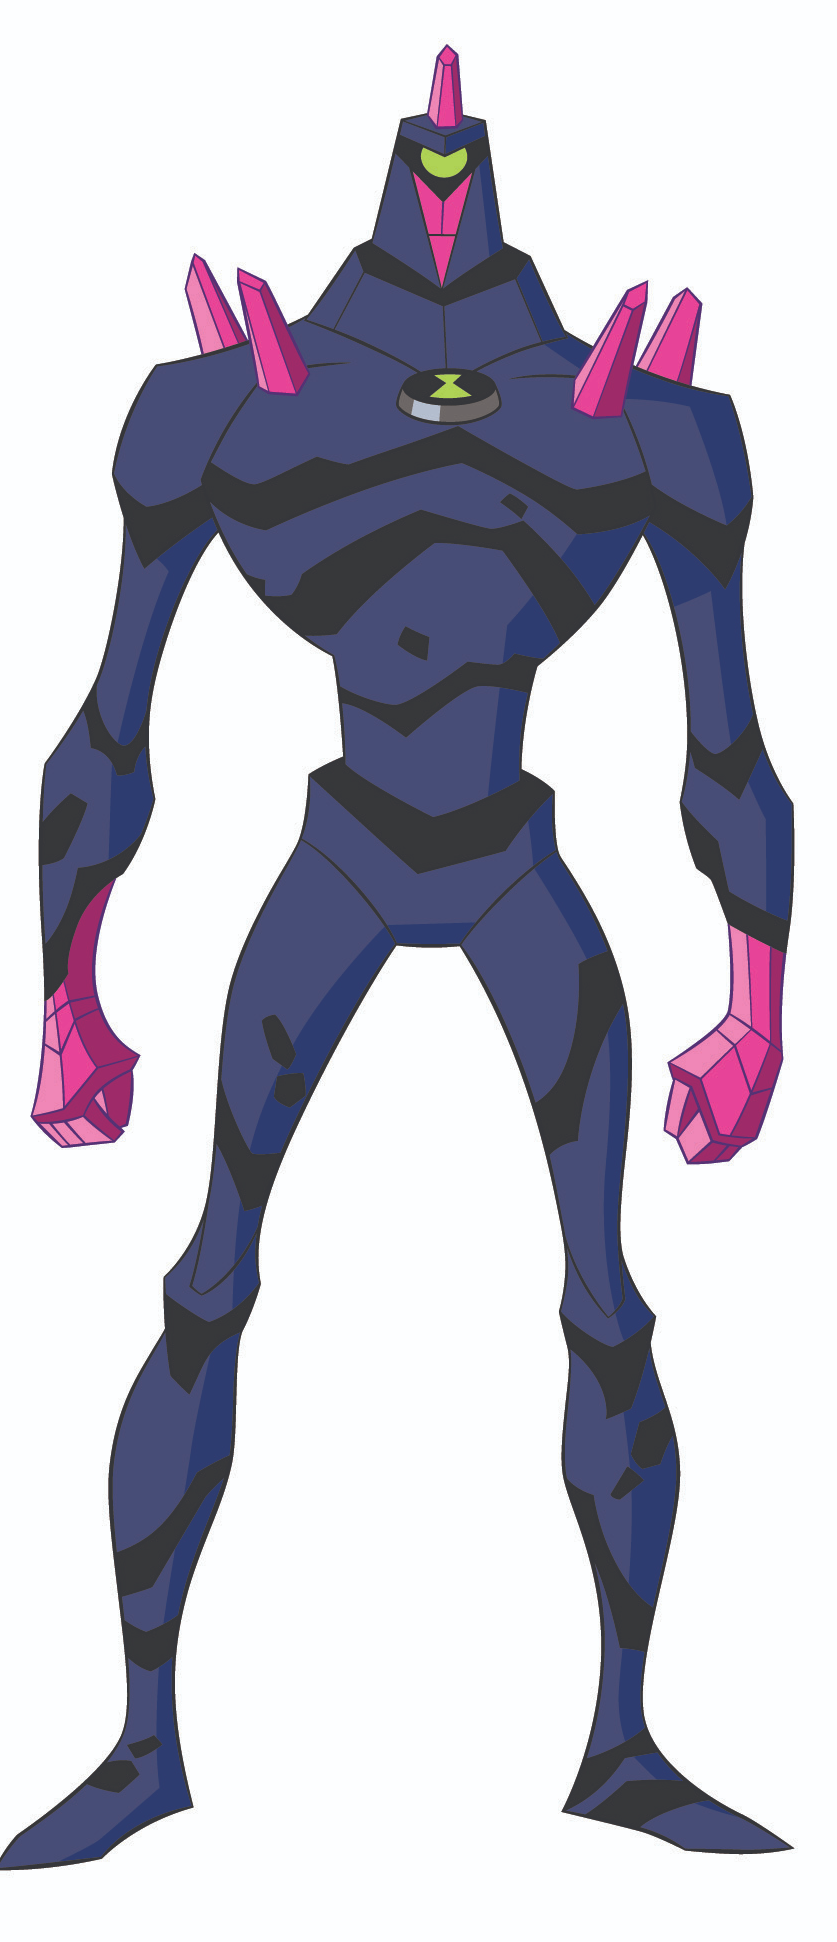 Chromastone Gallery Ben 10 Wiki Fandom Powered By Wikia Ben 10 Comics Ben 10 Ben 10 Alien Force